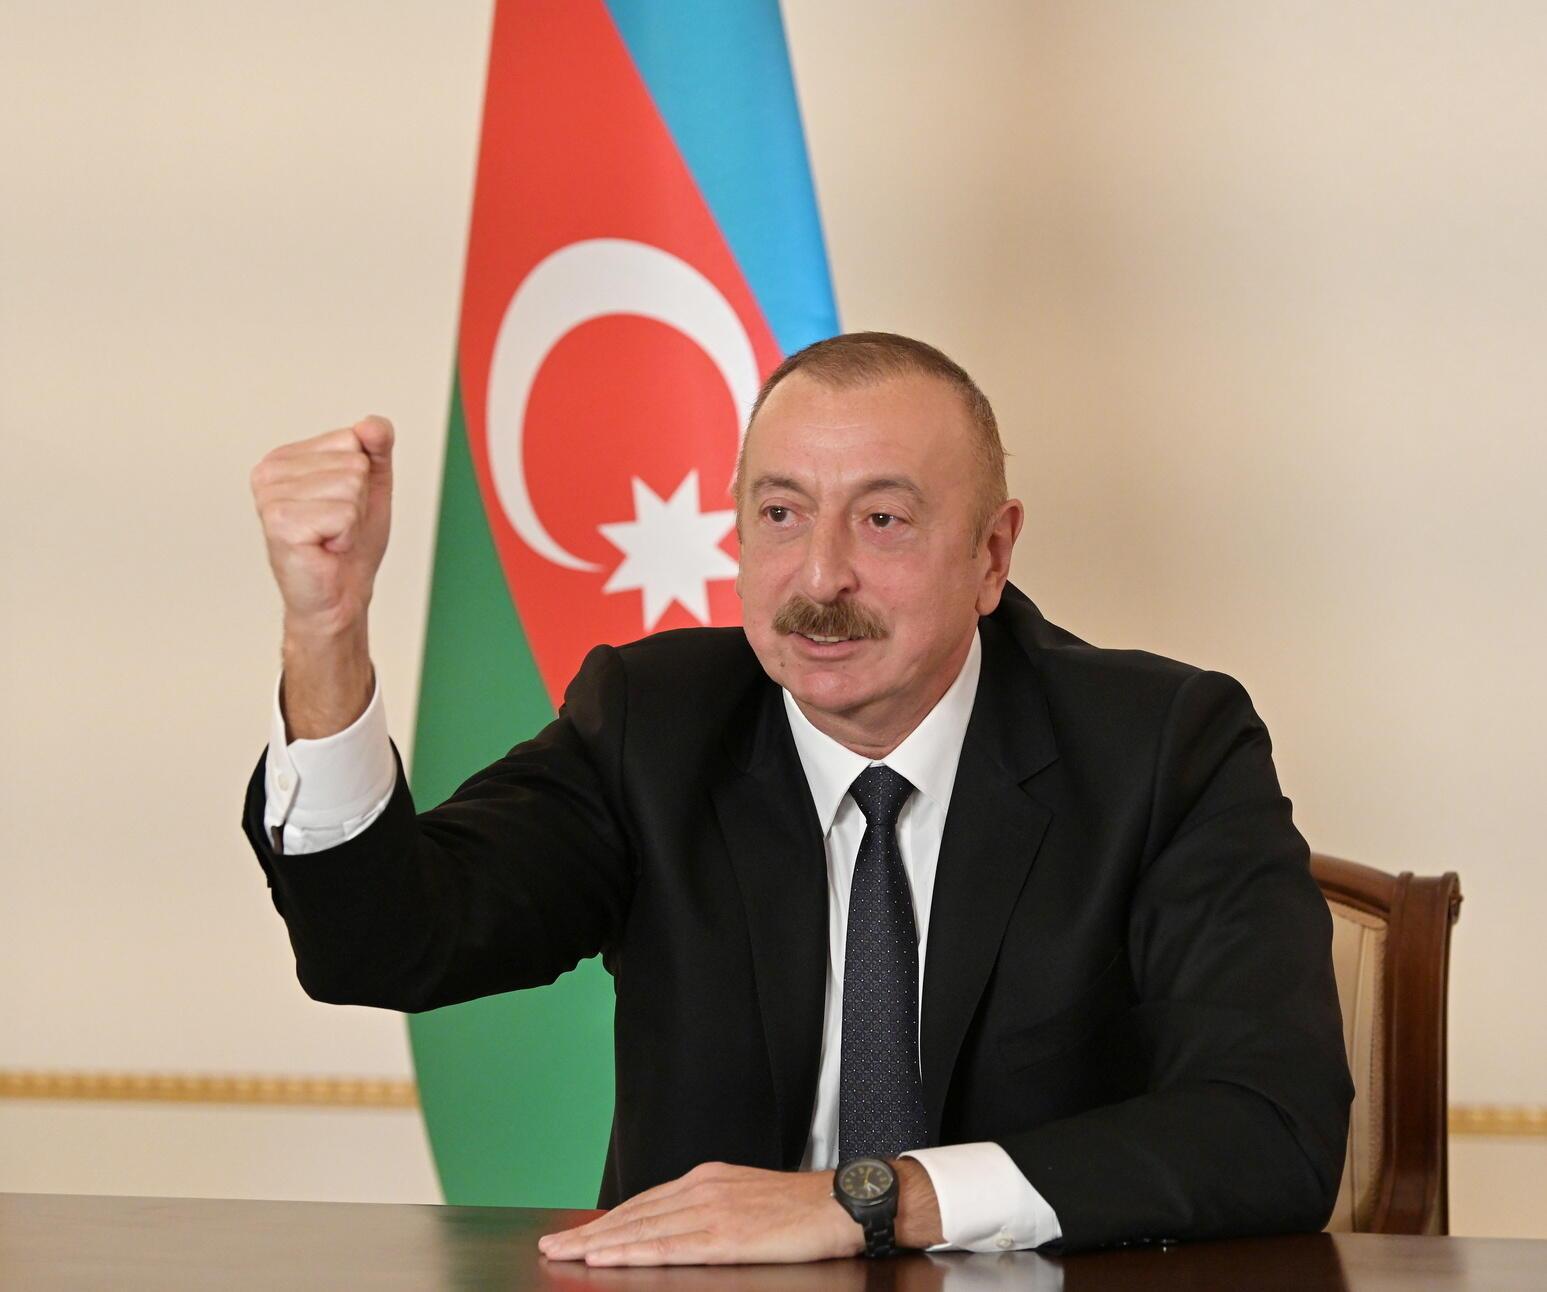 2020-10-26T101136Z_1041287766_RC2AQJ92YBEU_RTRMADP_3_ARMENIA-AZERBAIJAN-KARABAKH